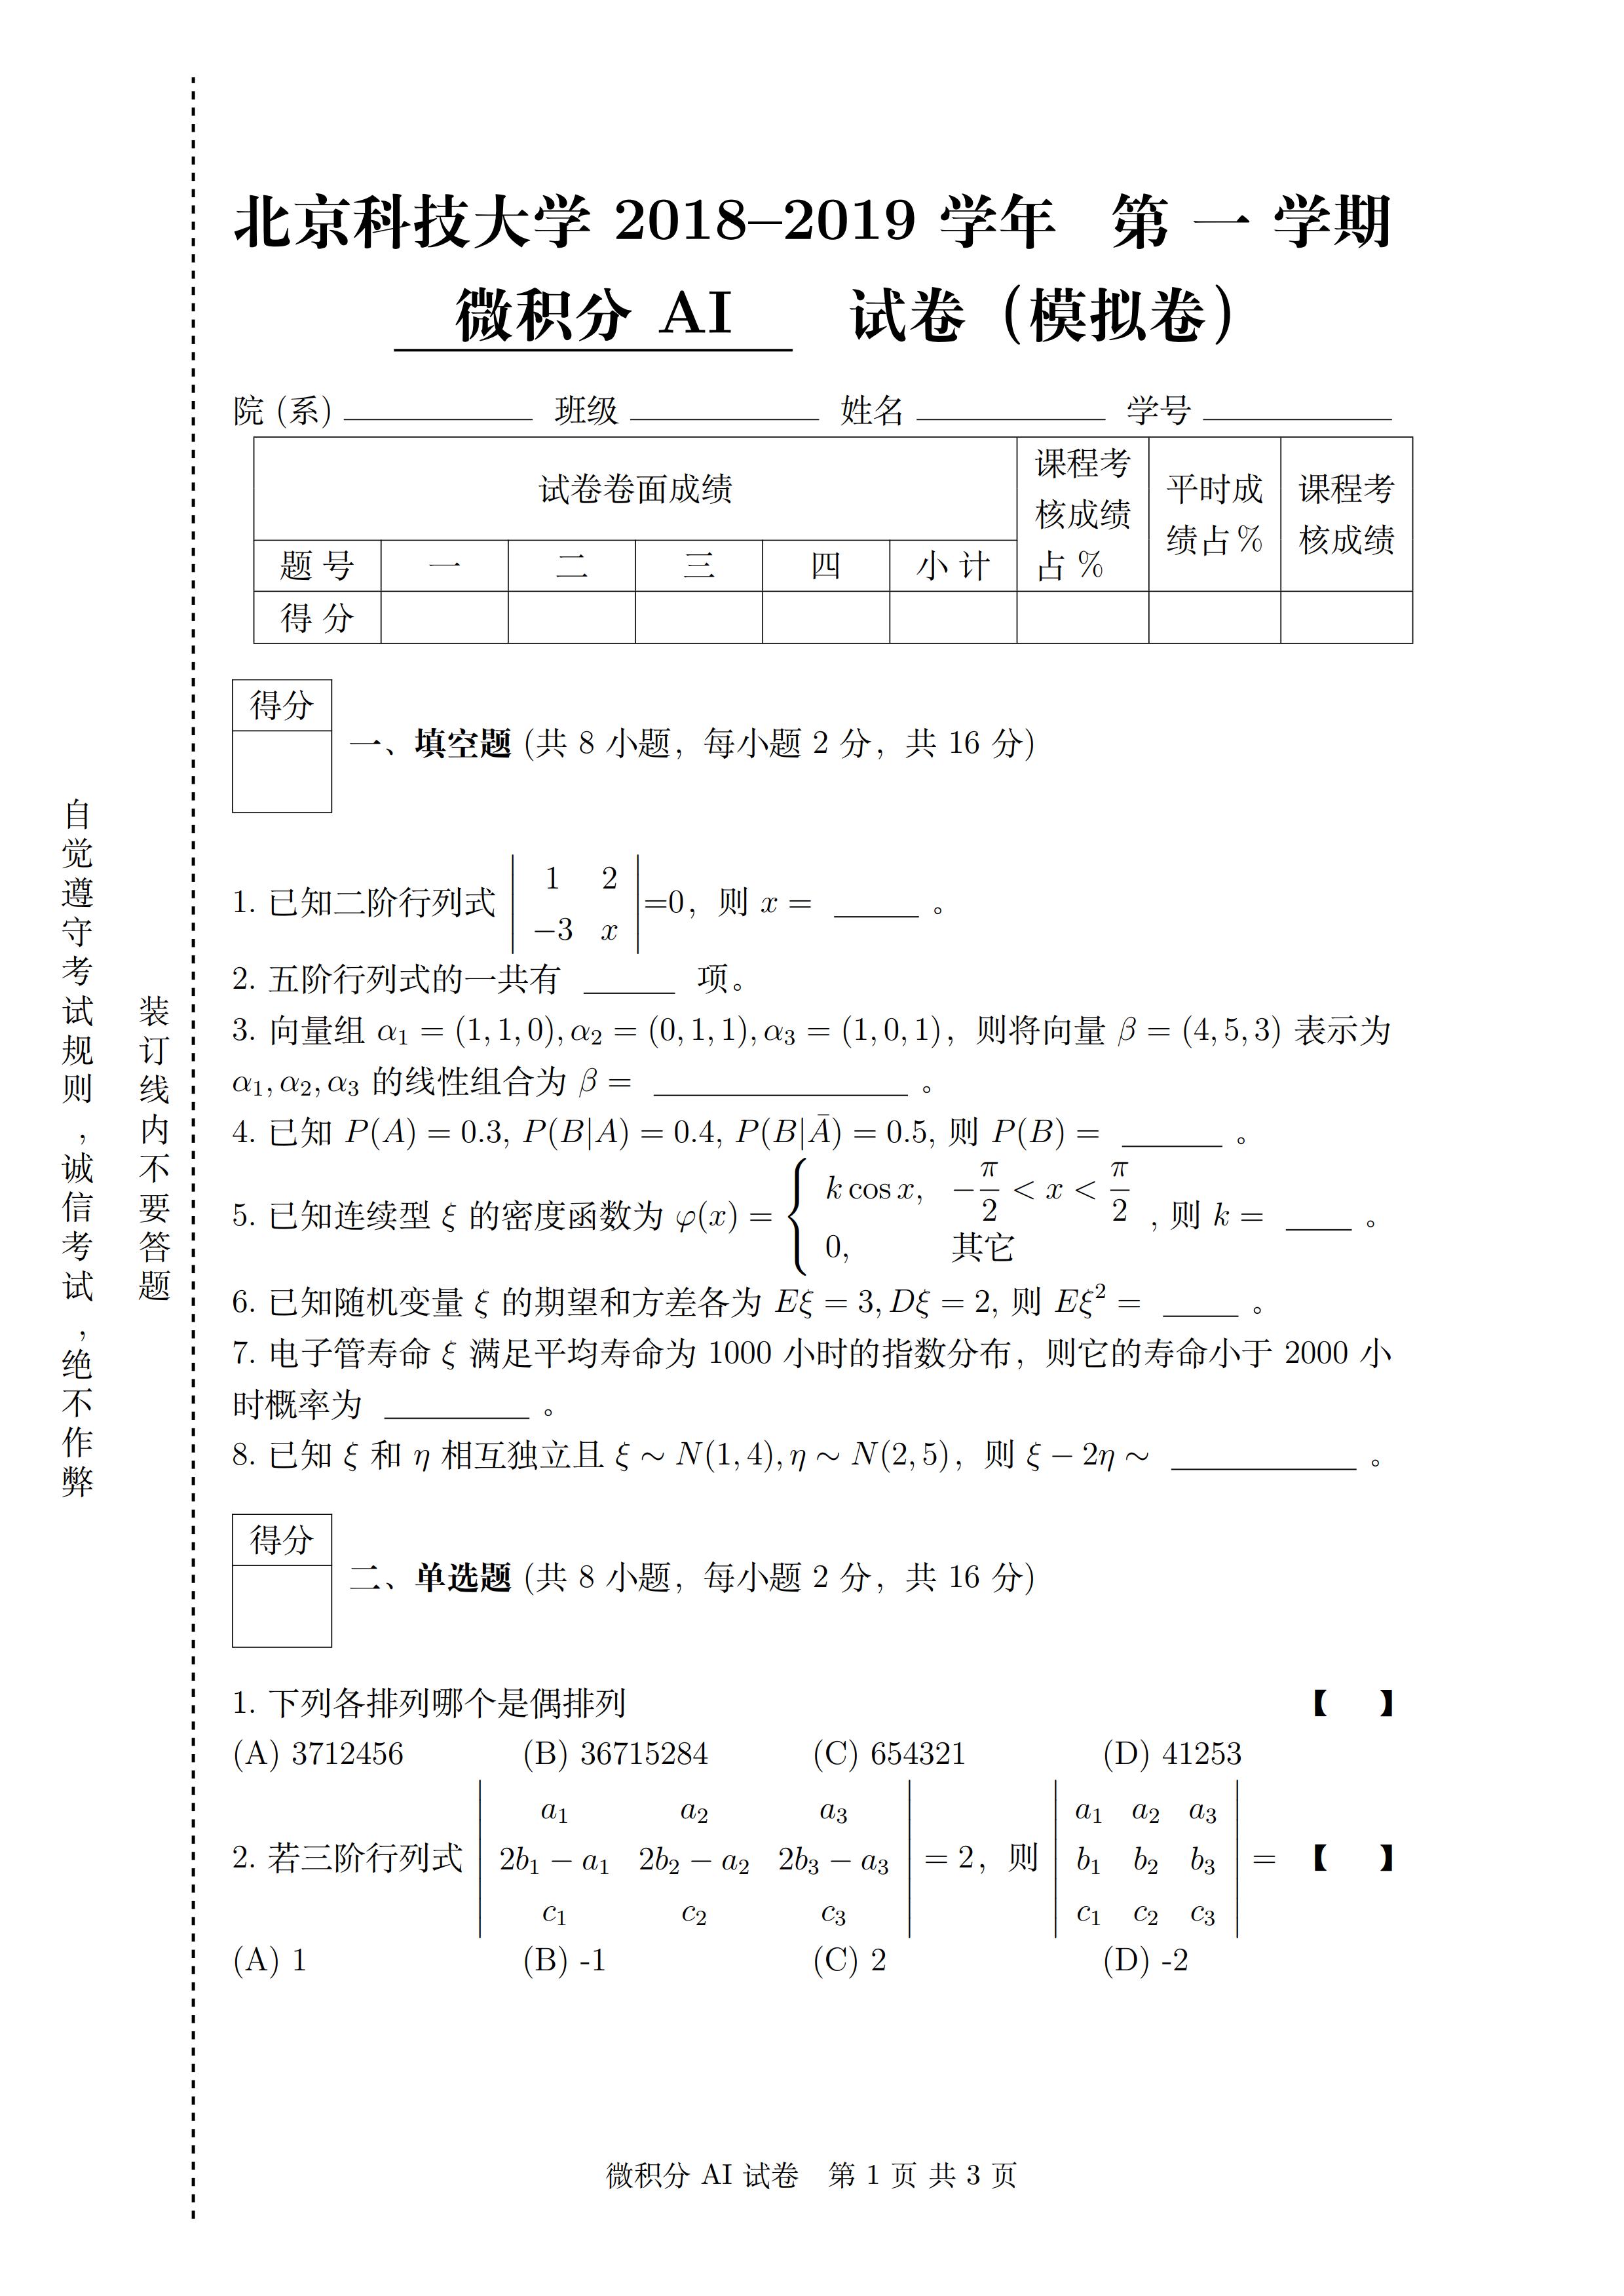 北京科技大学试卷 LaTeX 模板